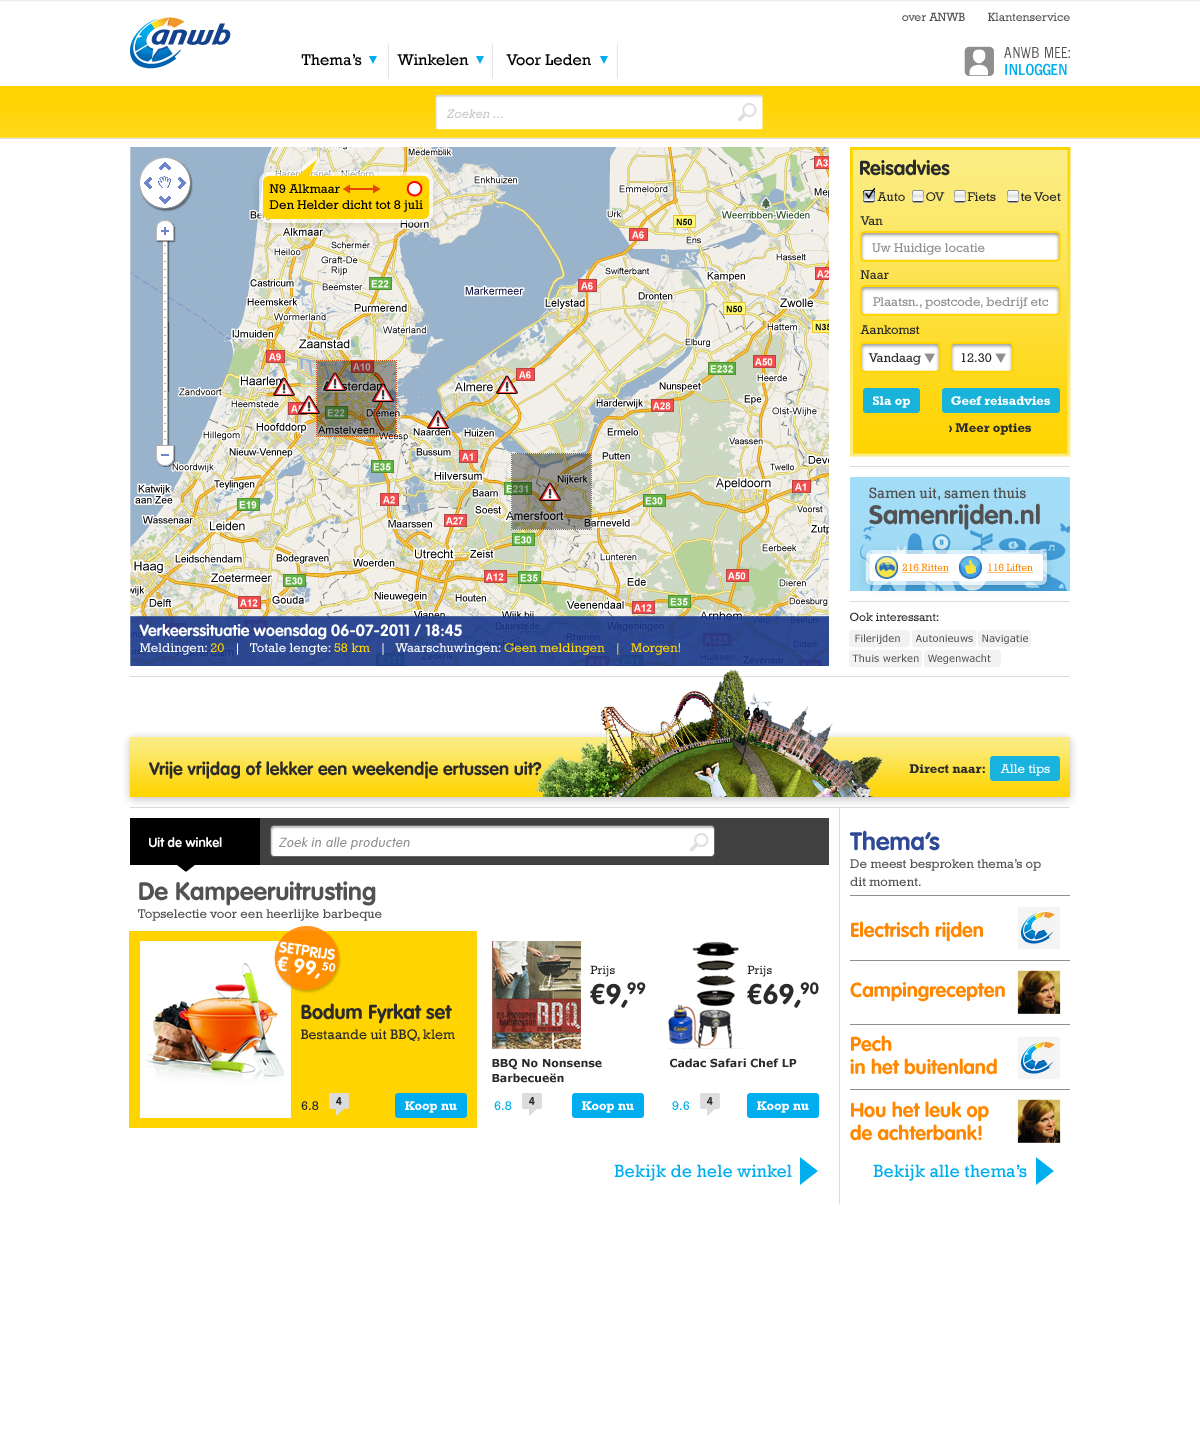 ANWB Homepage Vrijdagochtend